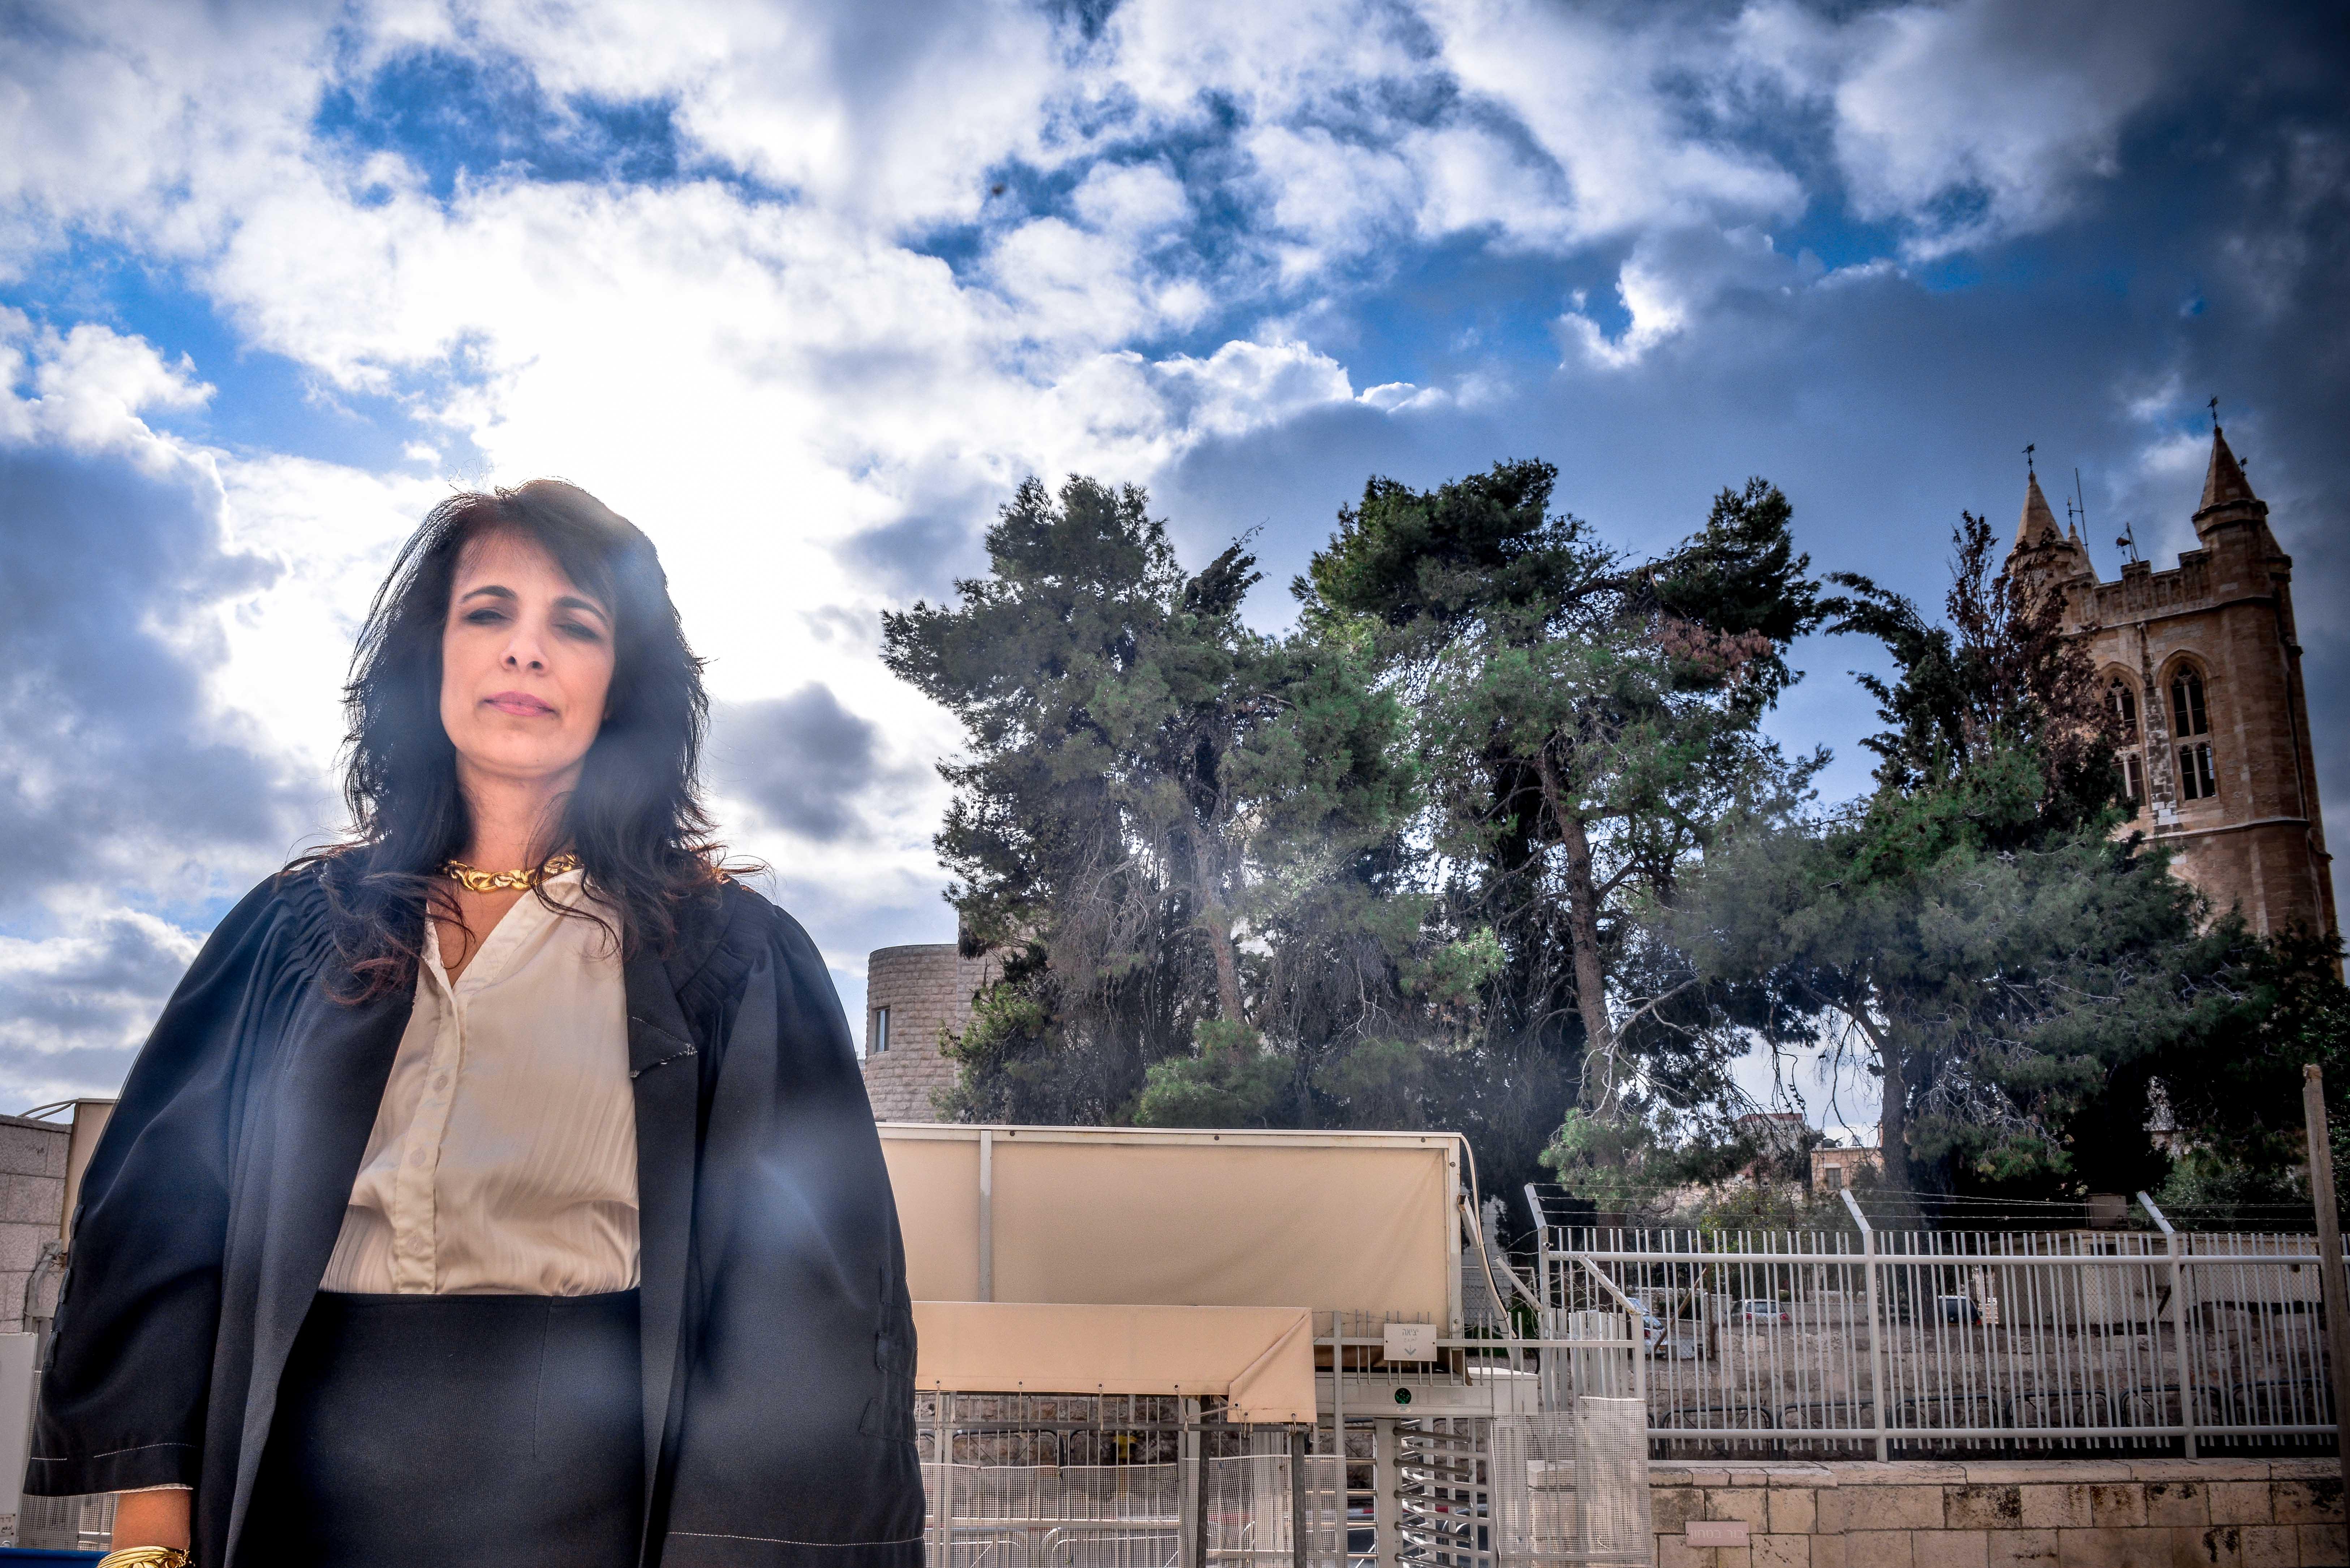 District Court of Jerusalem